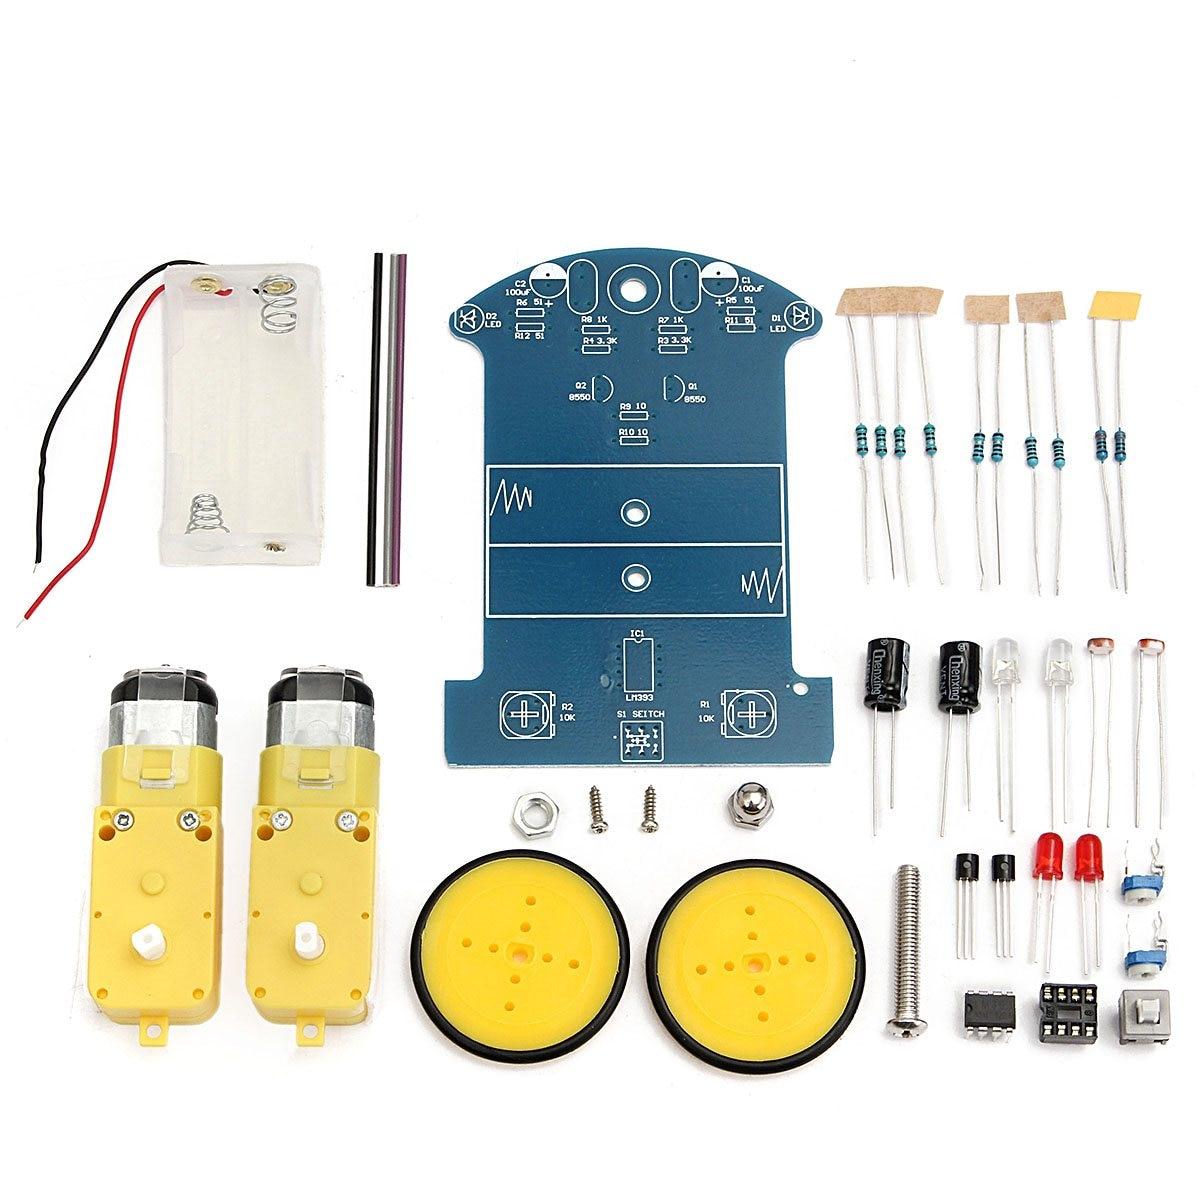 Hot New DIY Smart Tracking Robot Car Electronic Kit With Reduction Motor Set